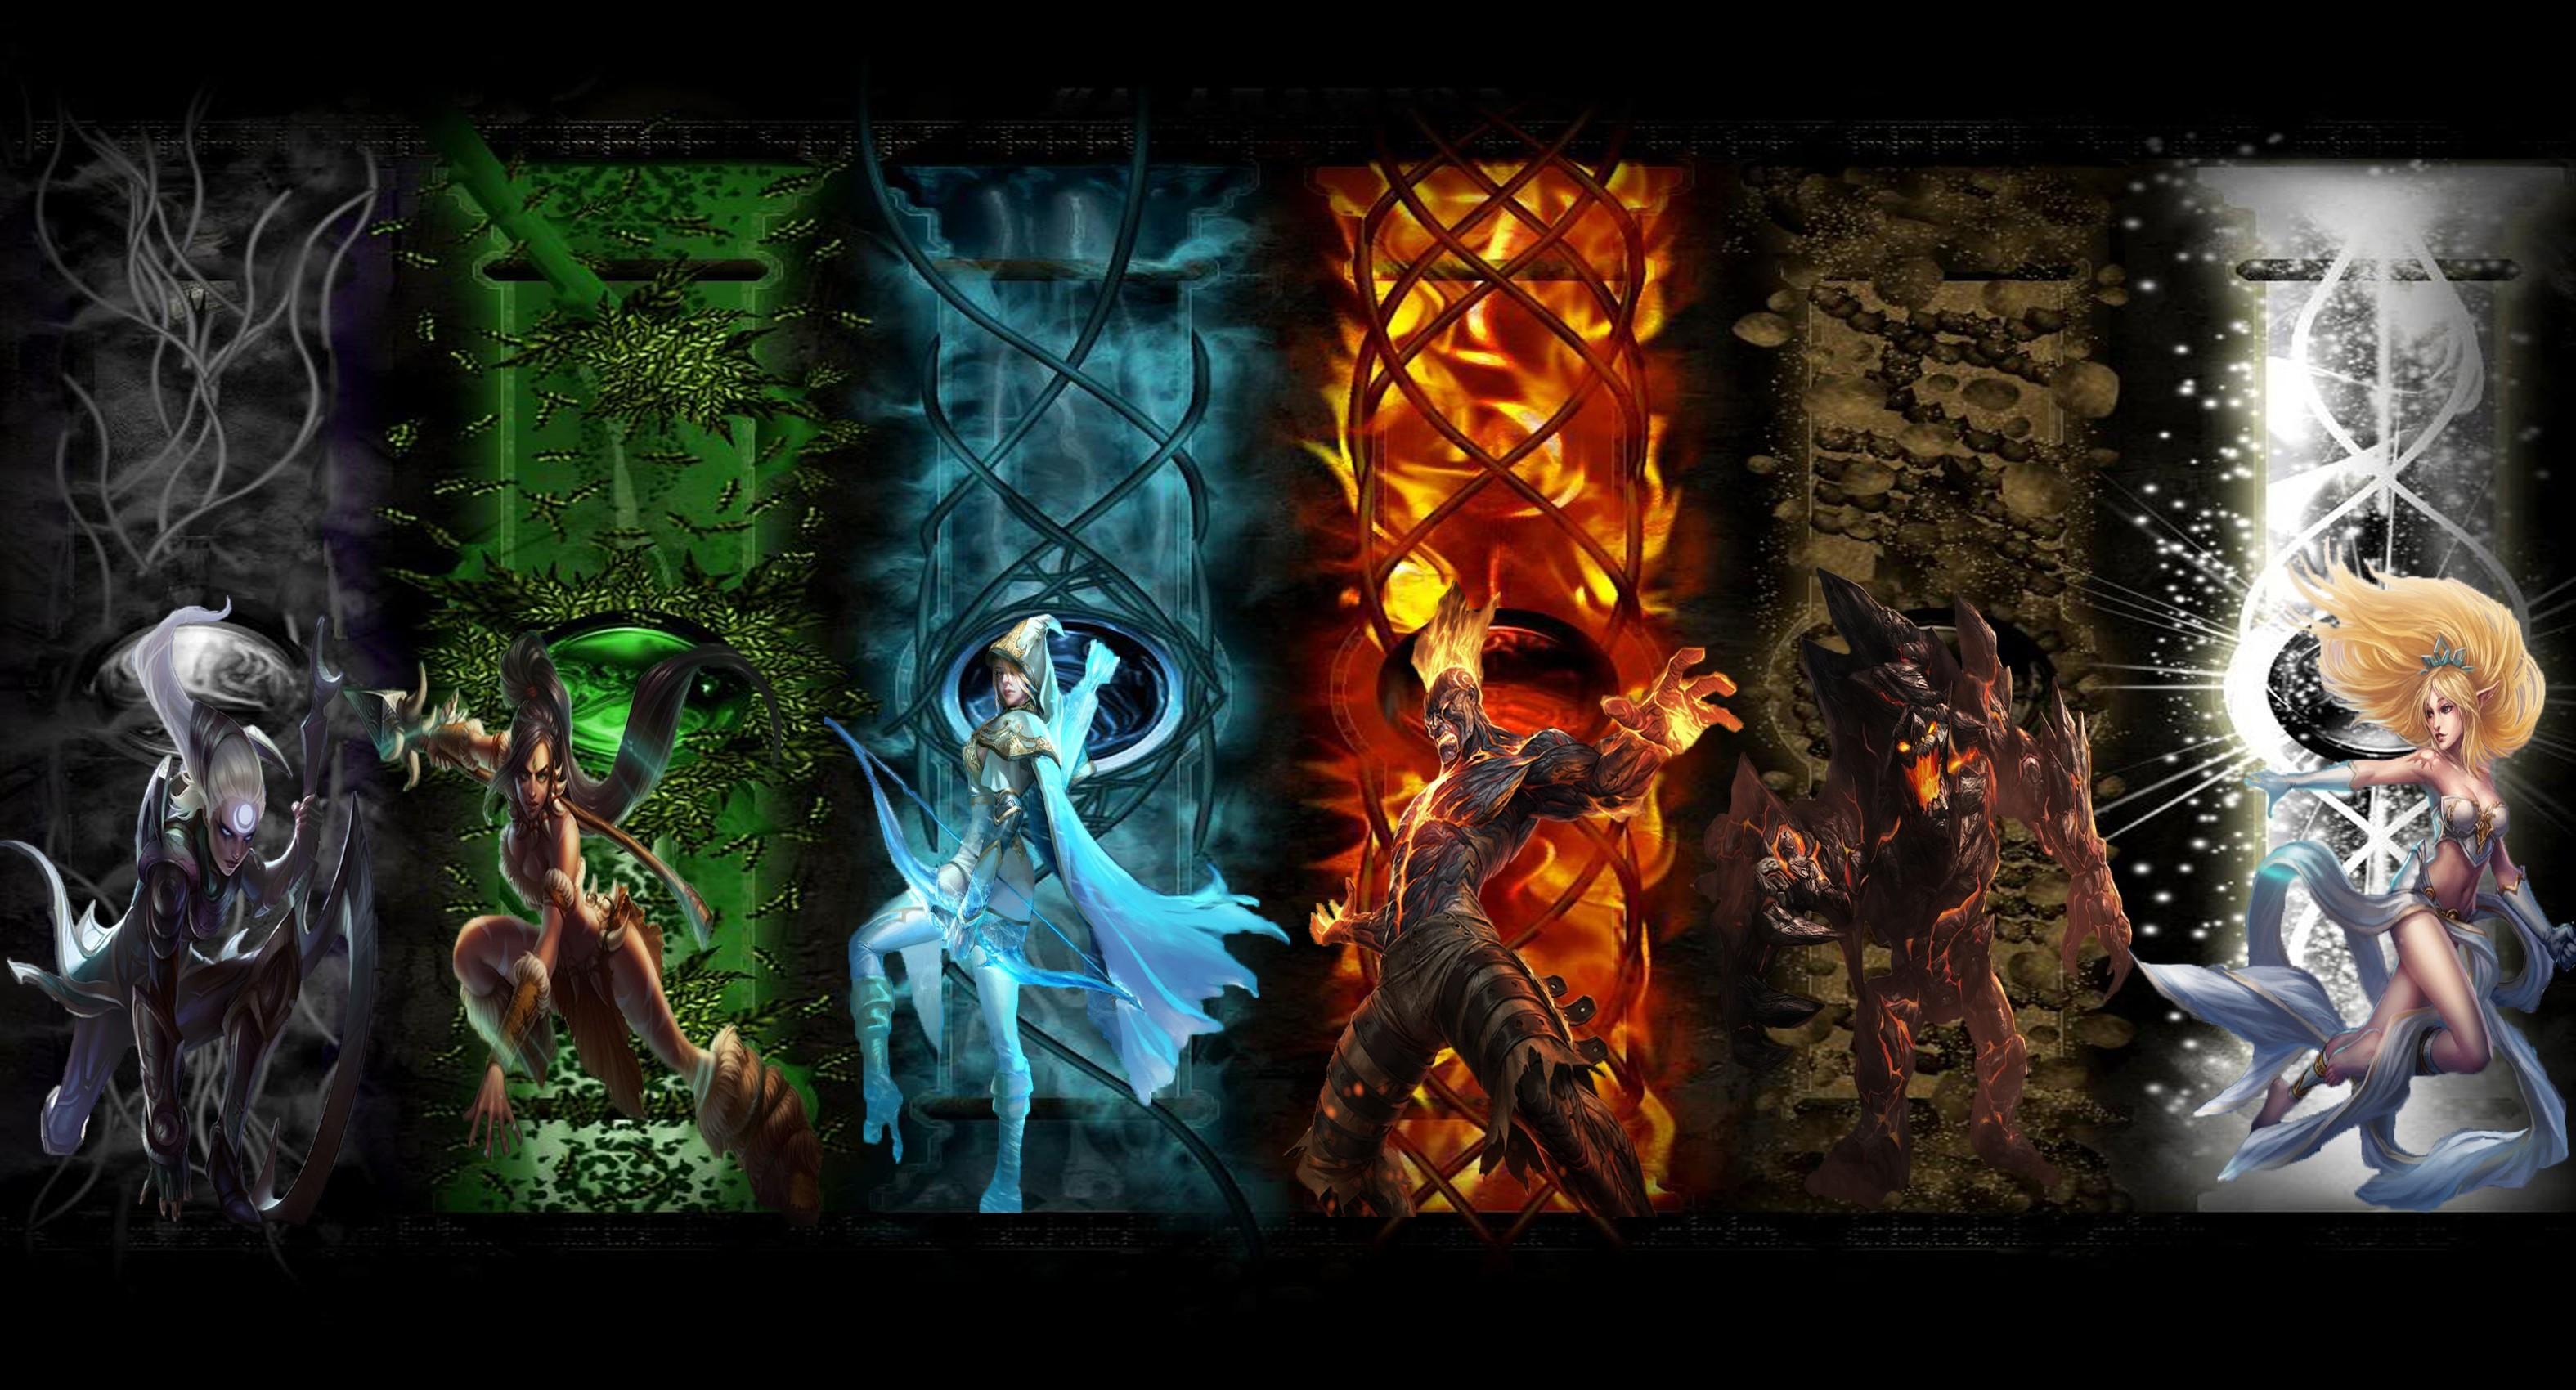 wallpaper 3150x1700 px ashe brand lol diana heroes janna